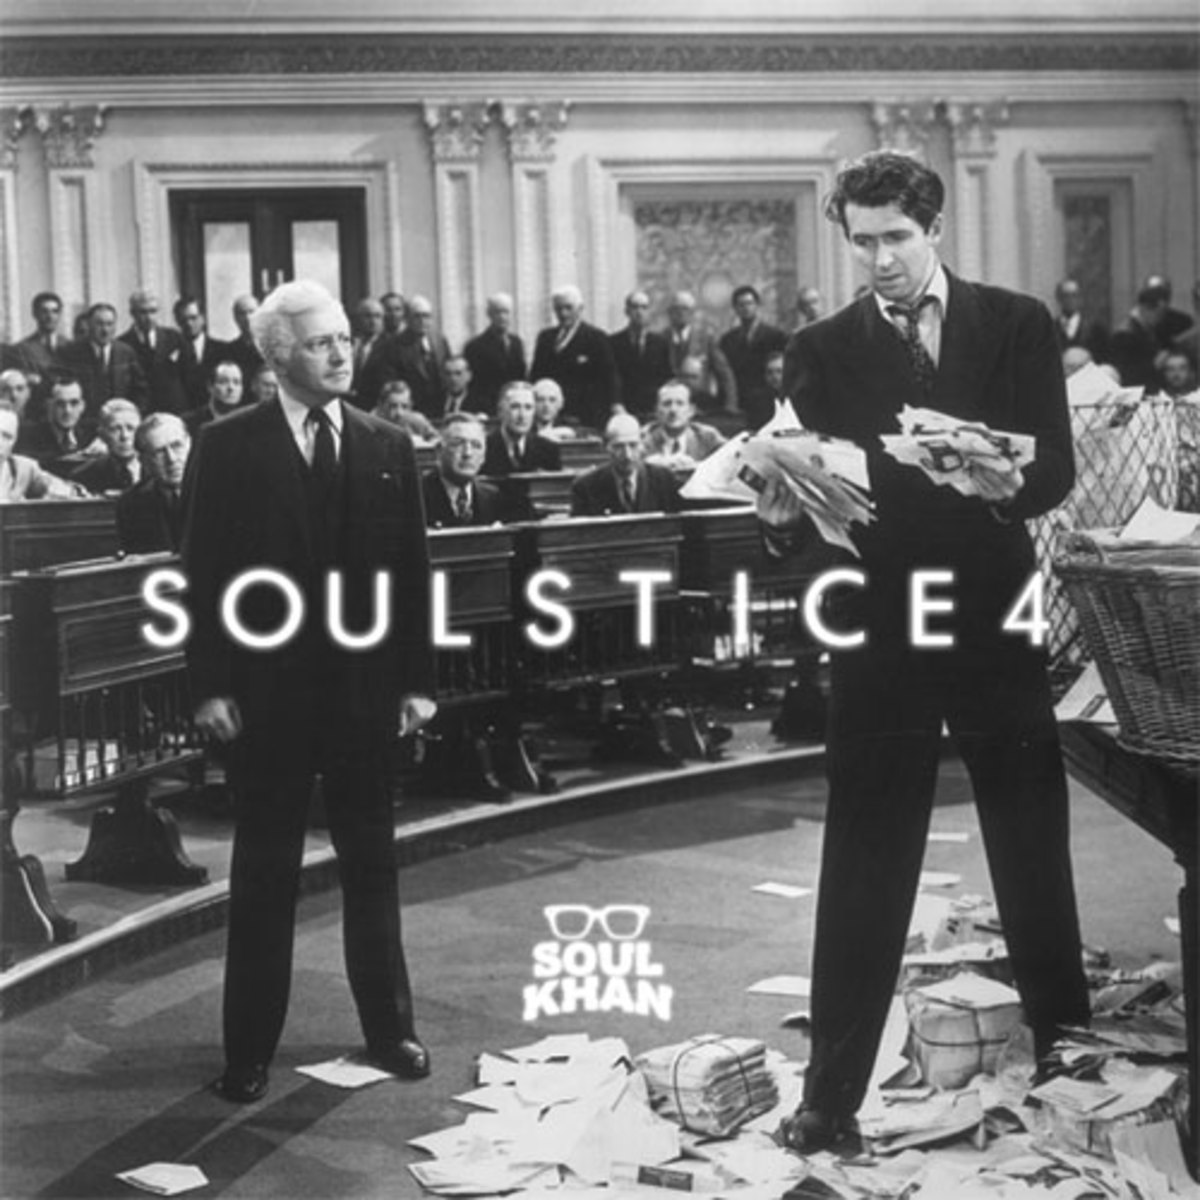 soulkhan-soulstice4.jpg